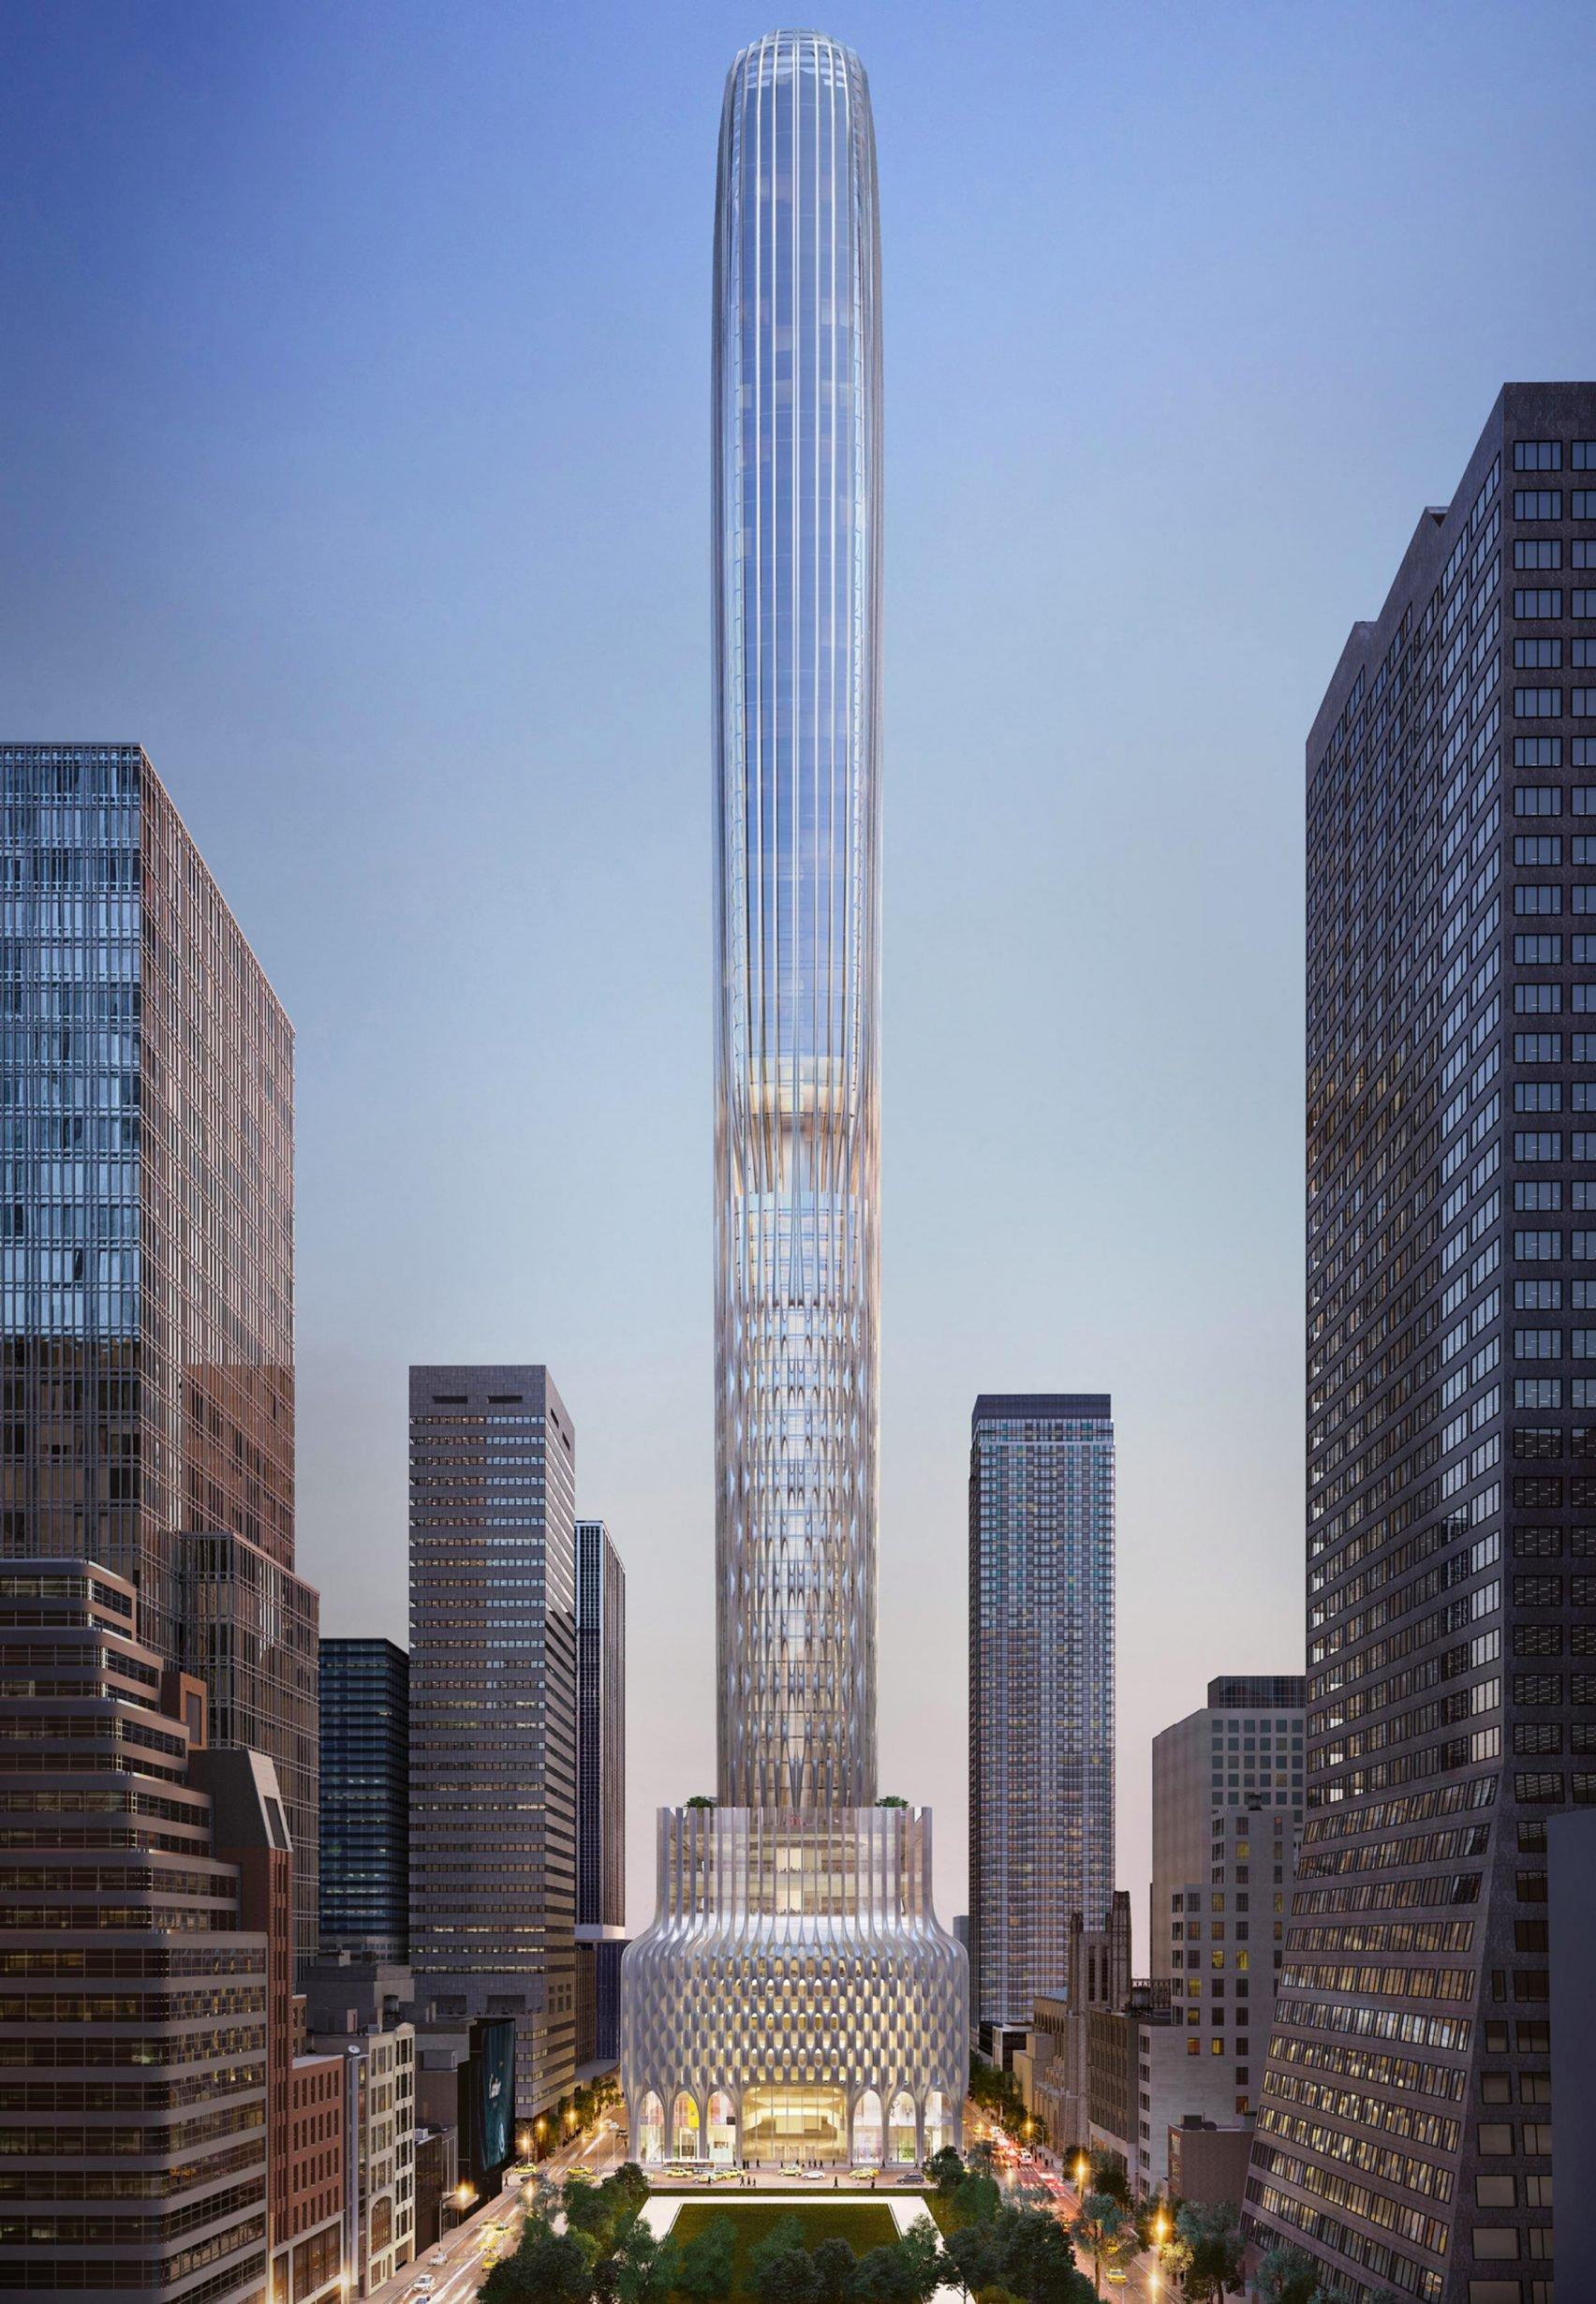 66-fifth_avenue_rendering-new-york-zaha-hadid-skyscrapers-architecture-news-usa_dezeen_2364_col_0-1704x2460.jpg